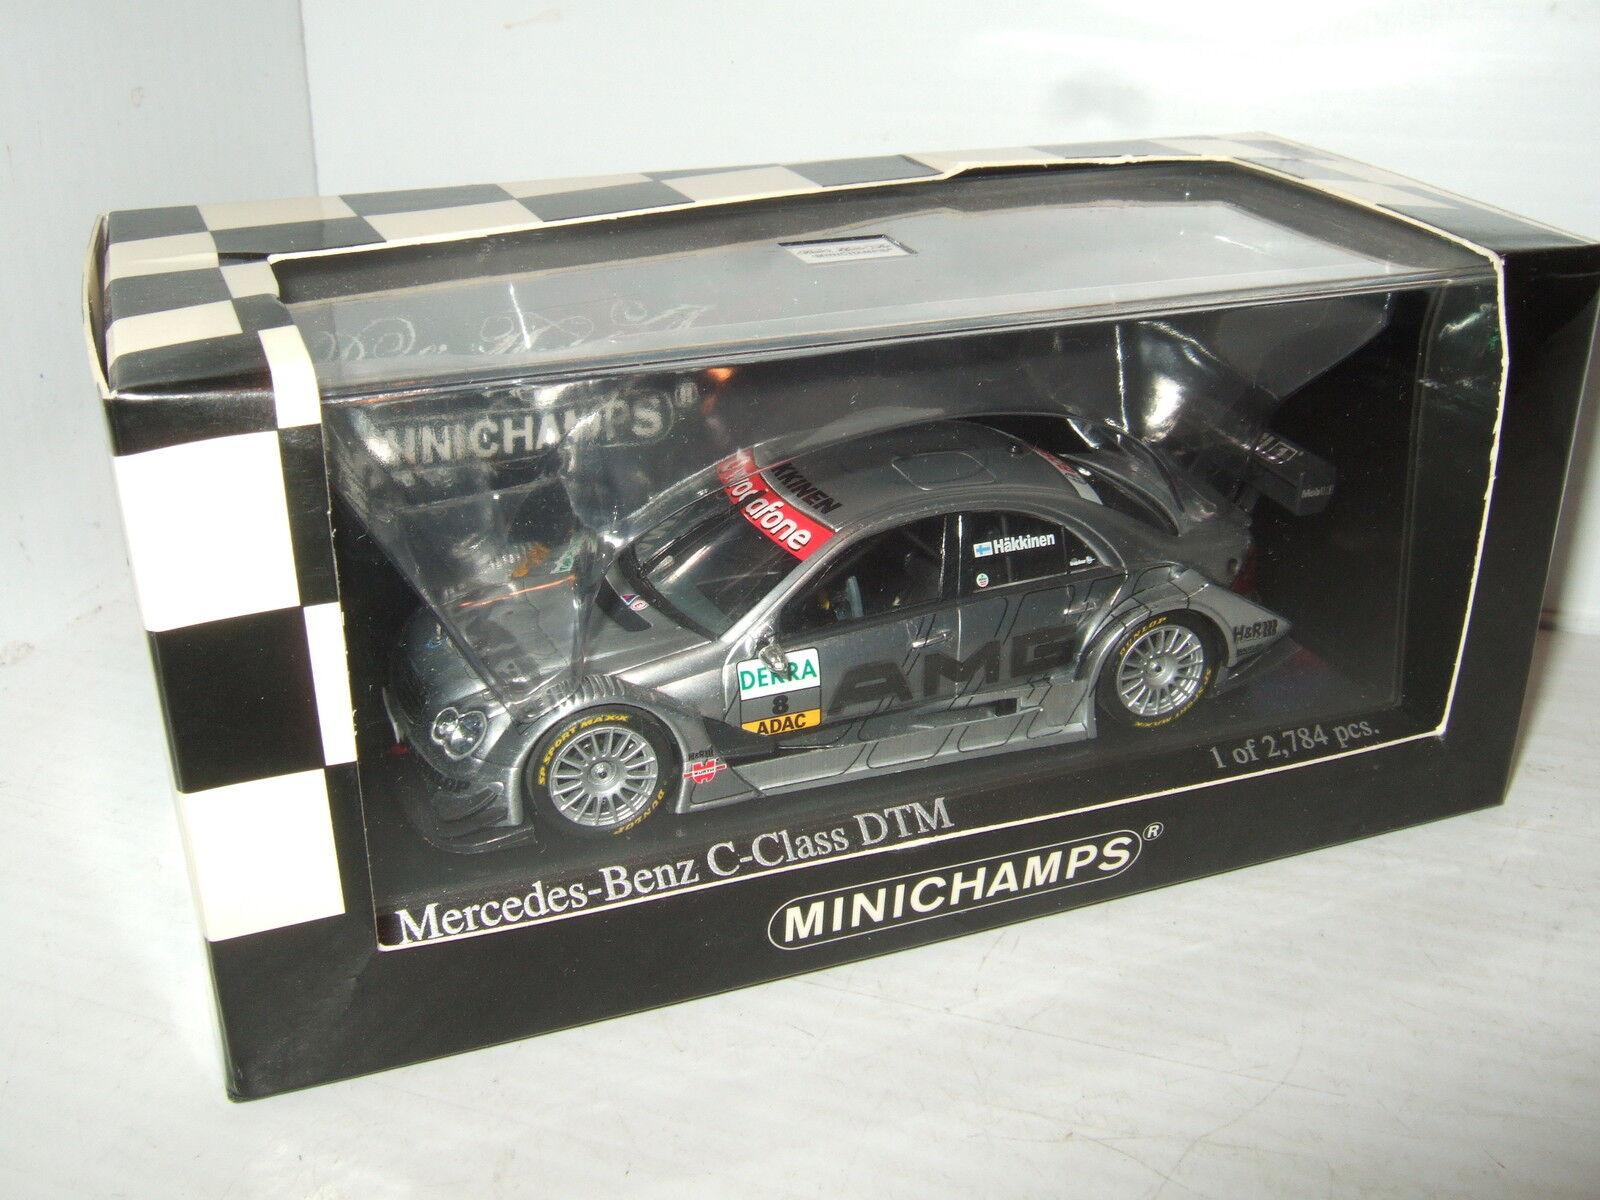 Rare New Minichamps Hakkinens Mercedes C Class DTM 2006 Diecast Model in 1 43